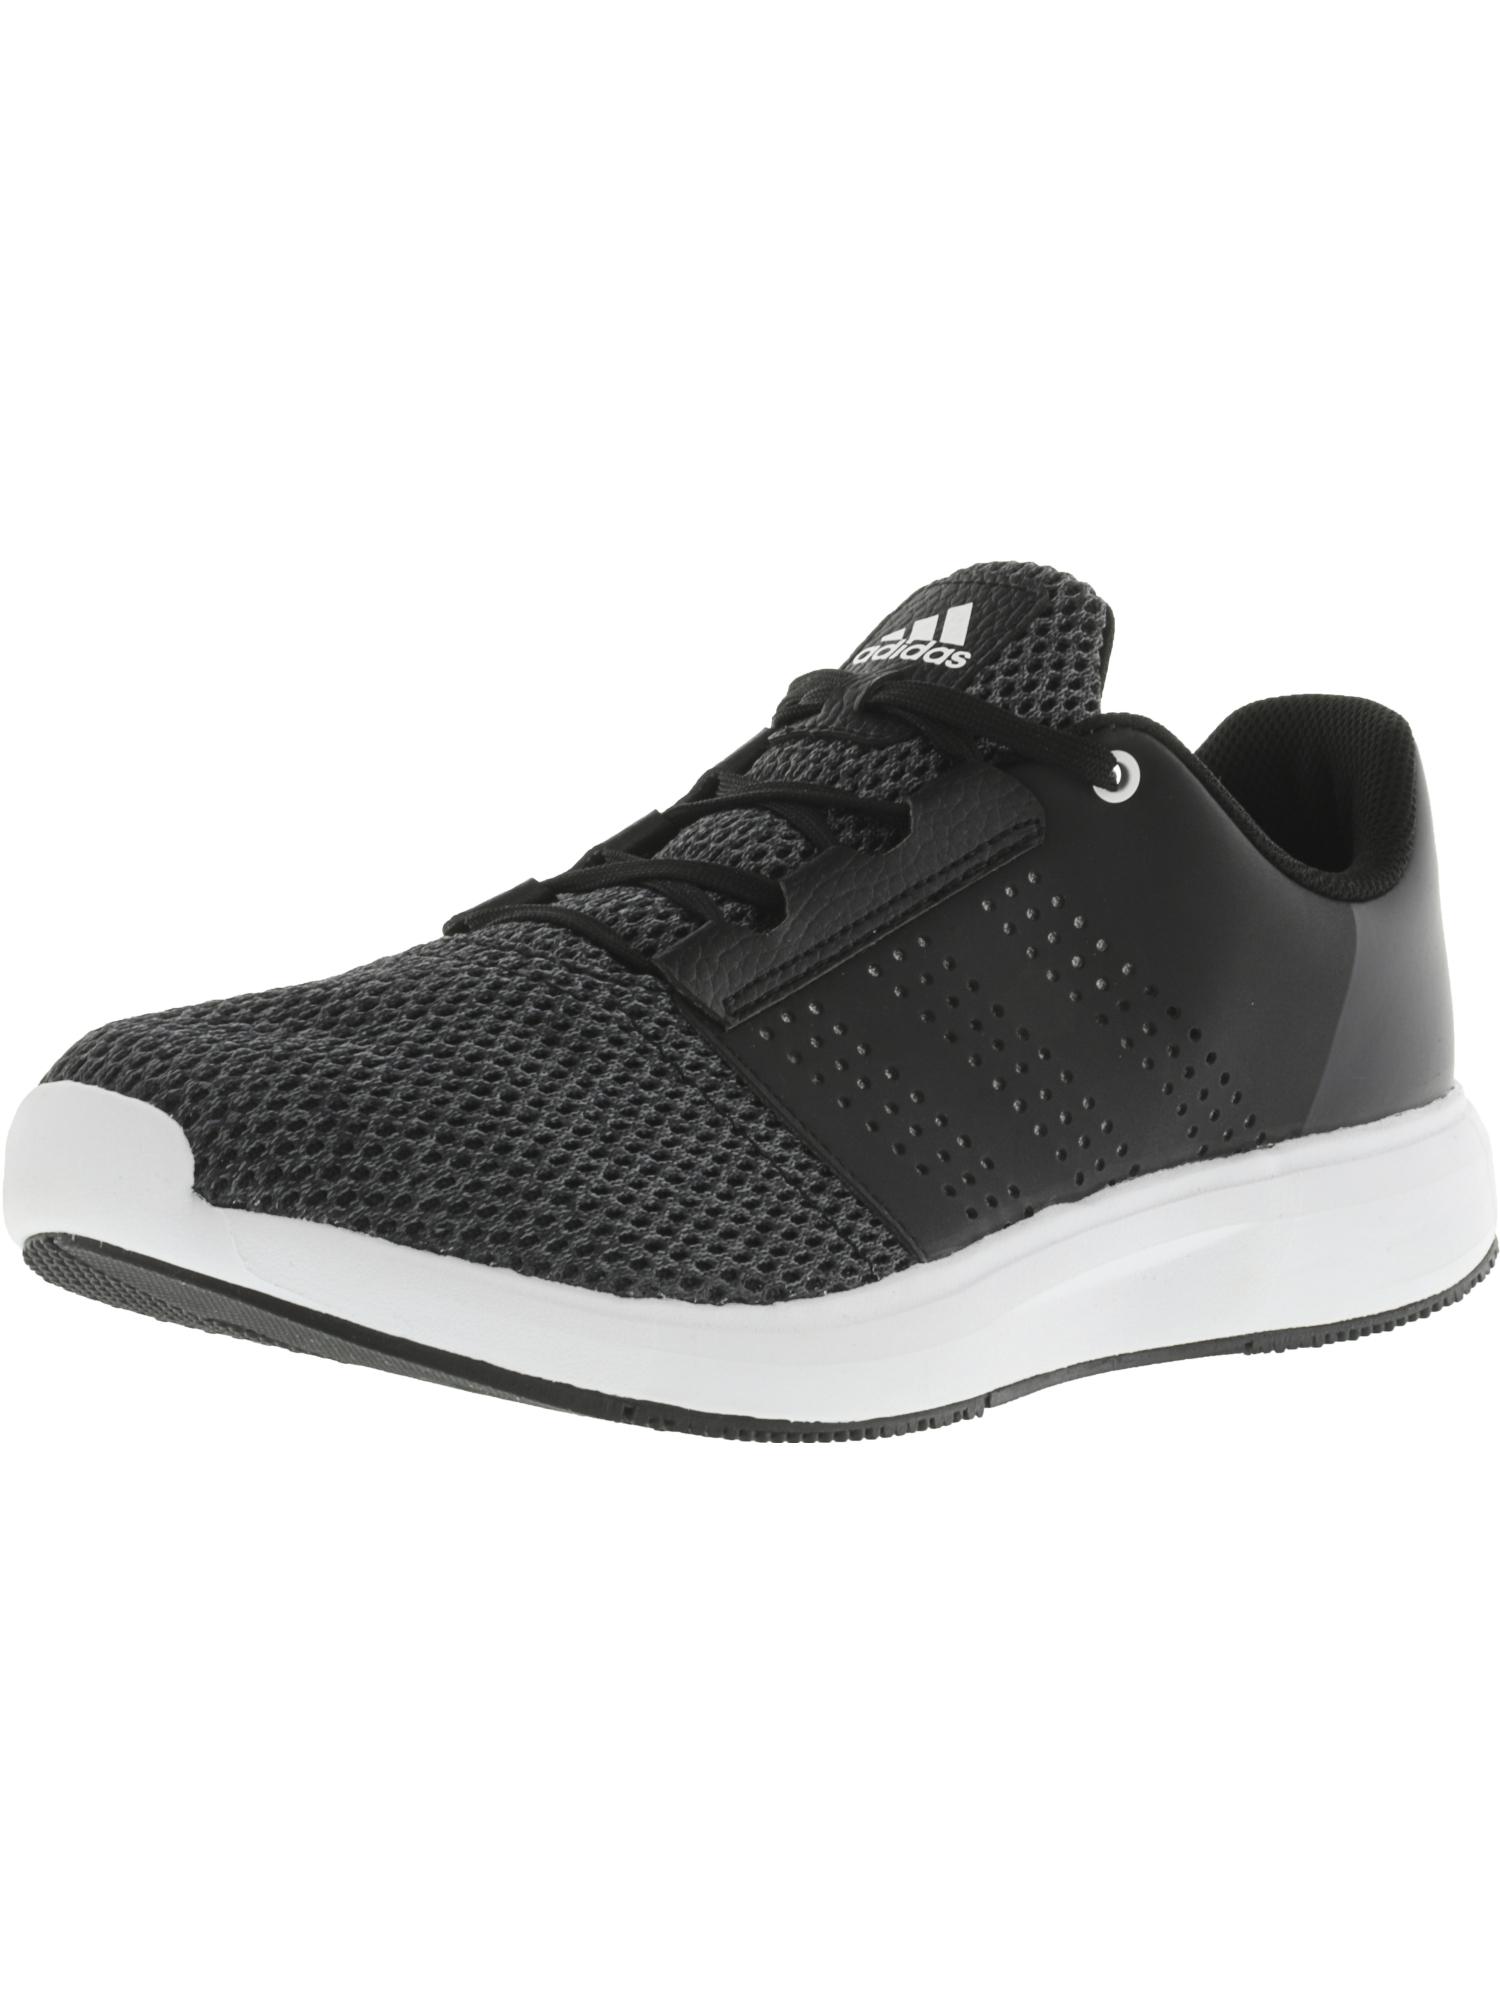 d95724bf522ca8 ... order adidas performance mens madoru 2 m running shoe black sz11 ebay  8ce61 09294